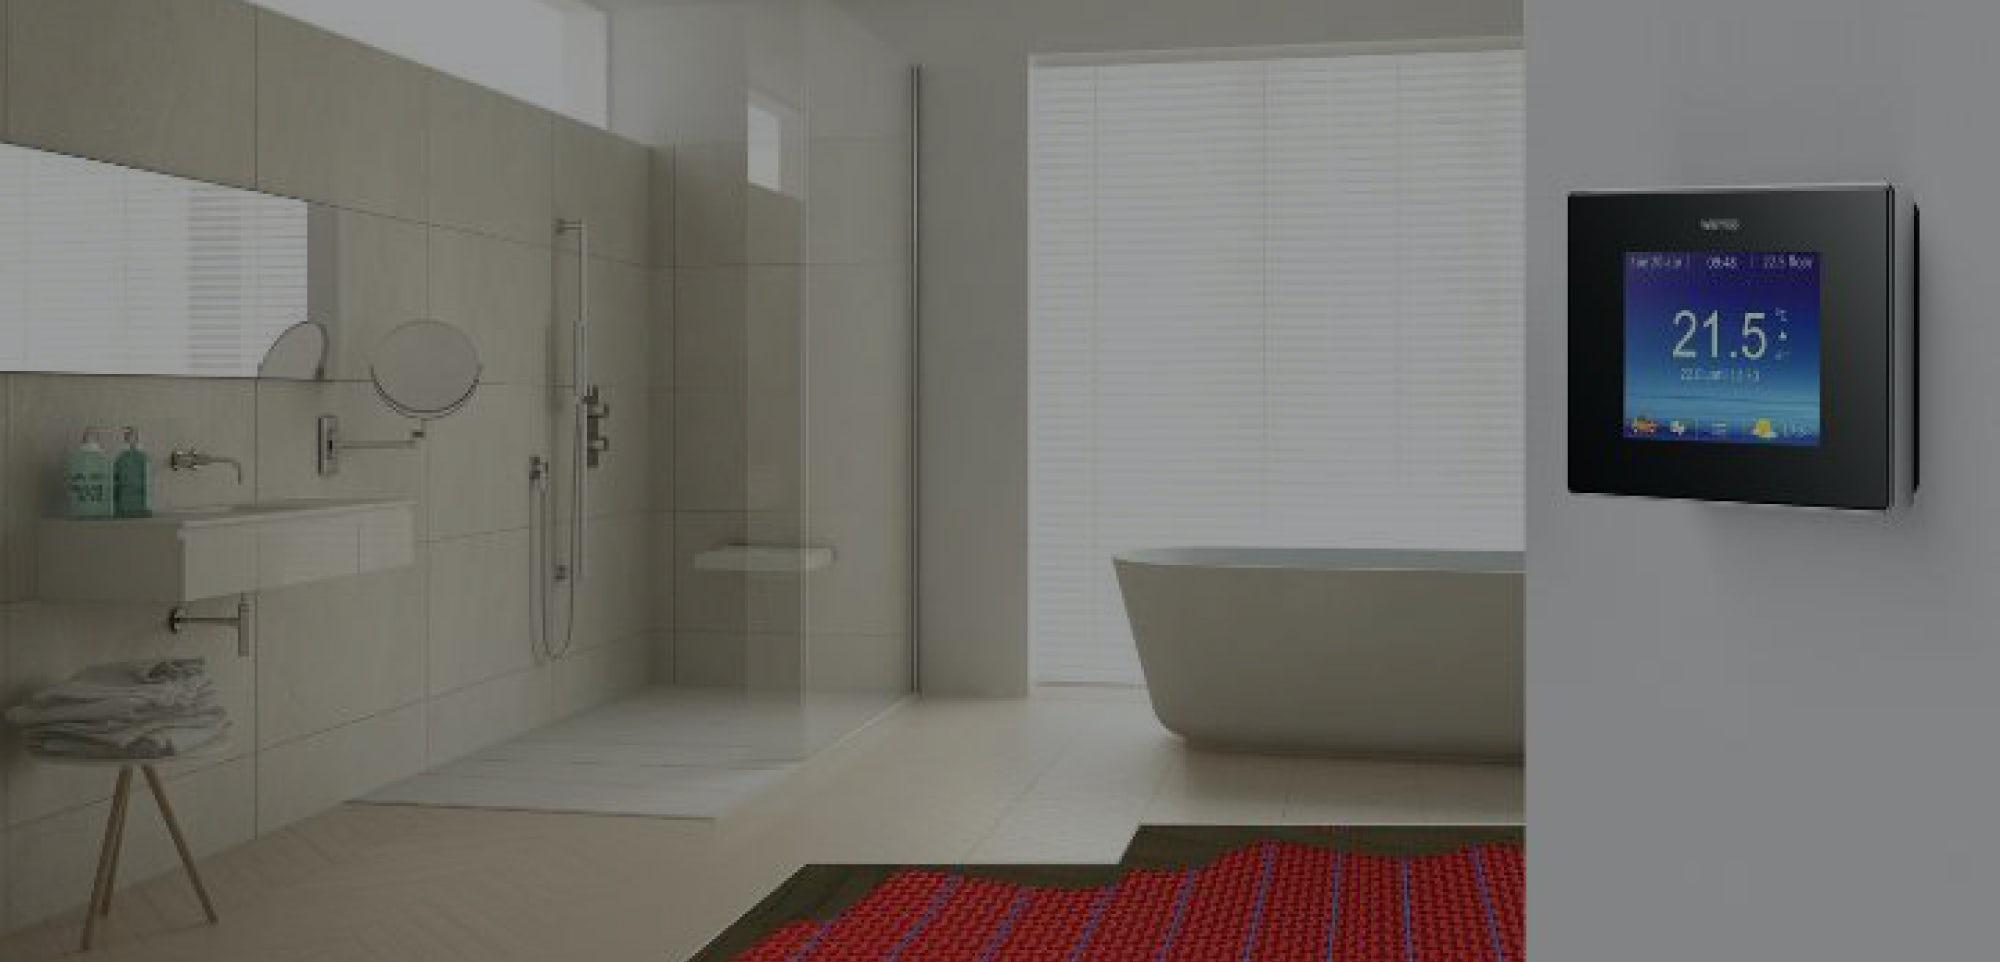 warmup underfloor heating buying guide [ 2000 x 962 Pixel ]